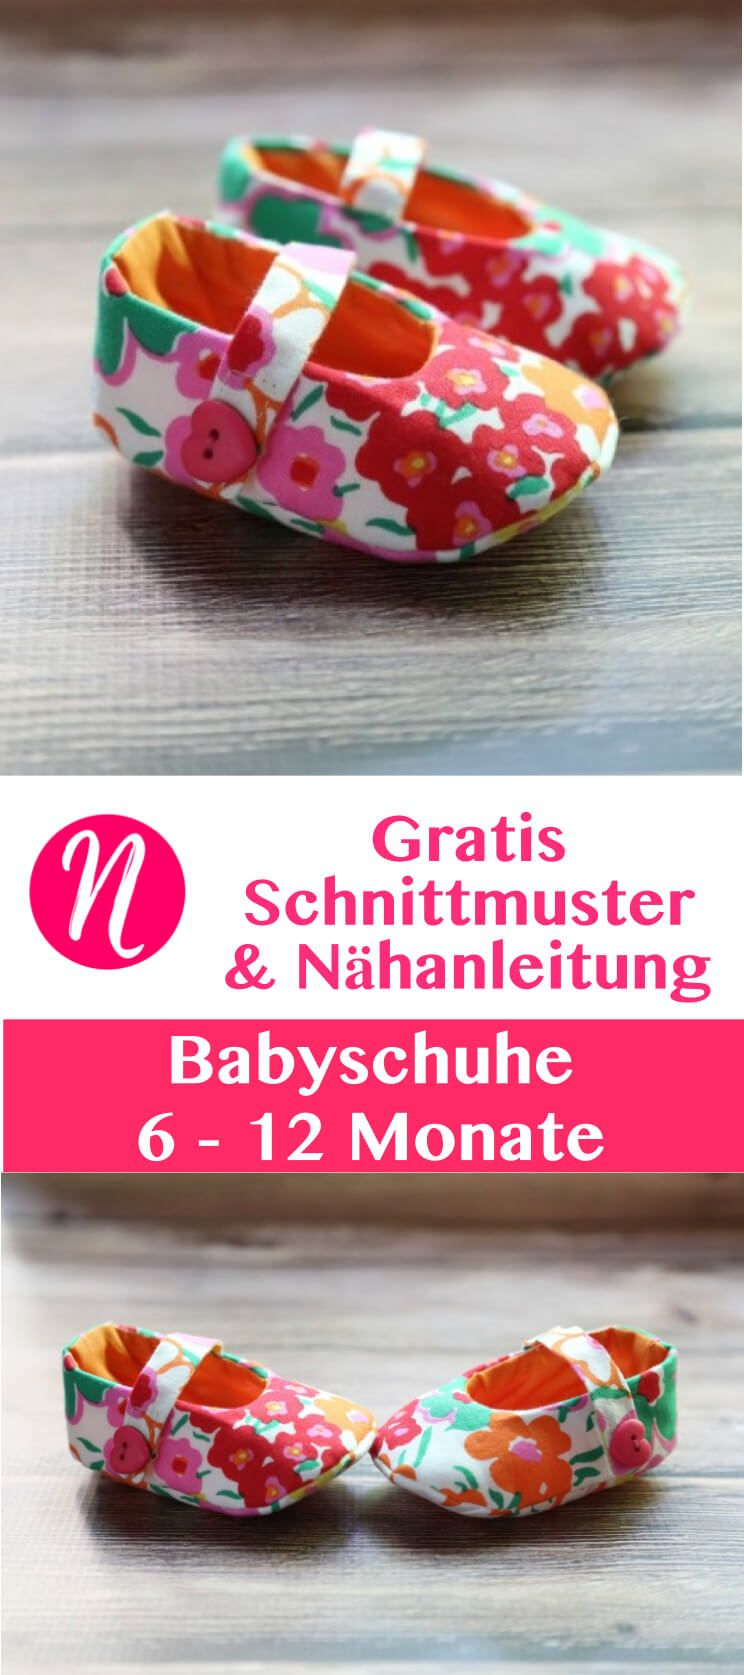 outlet store 7e32b abfc4 Babyschuhe Freebook - zum selber nähen - 6 - 12 Monate ...